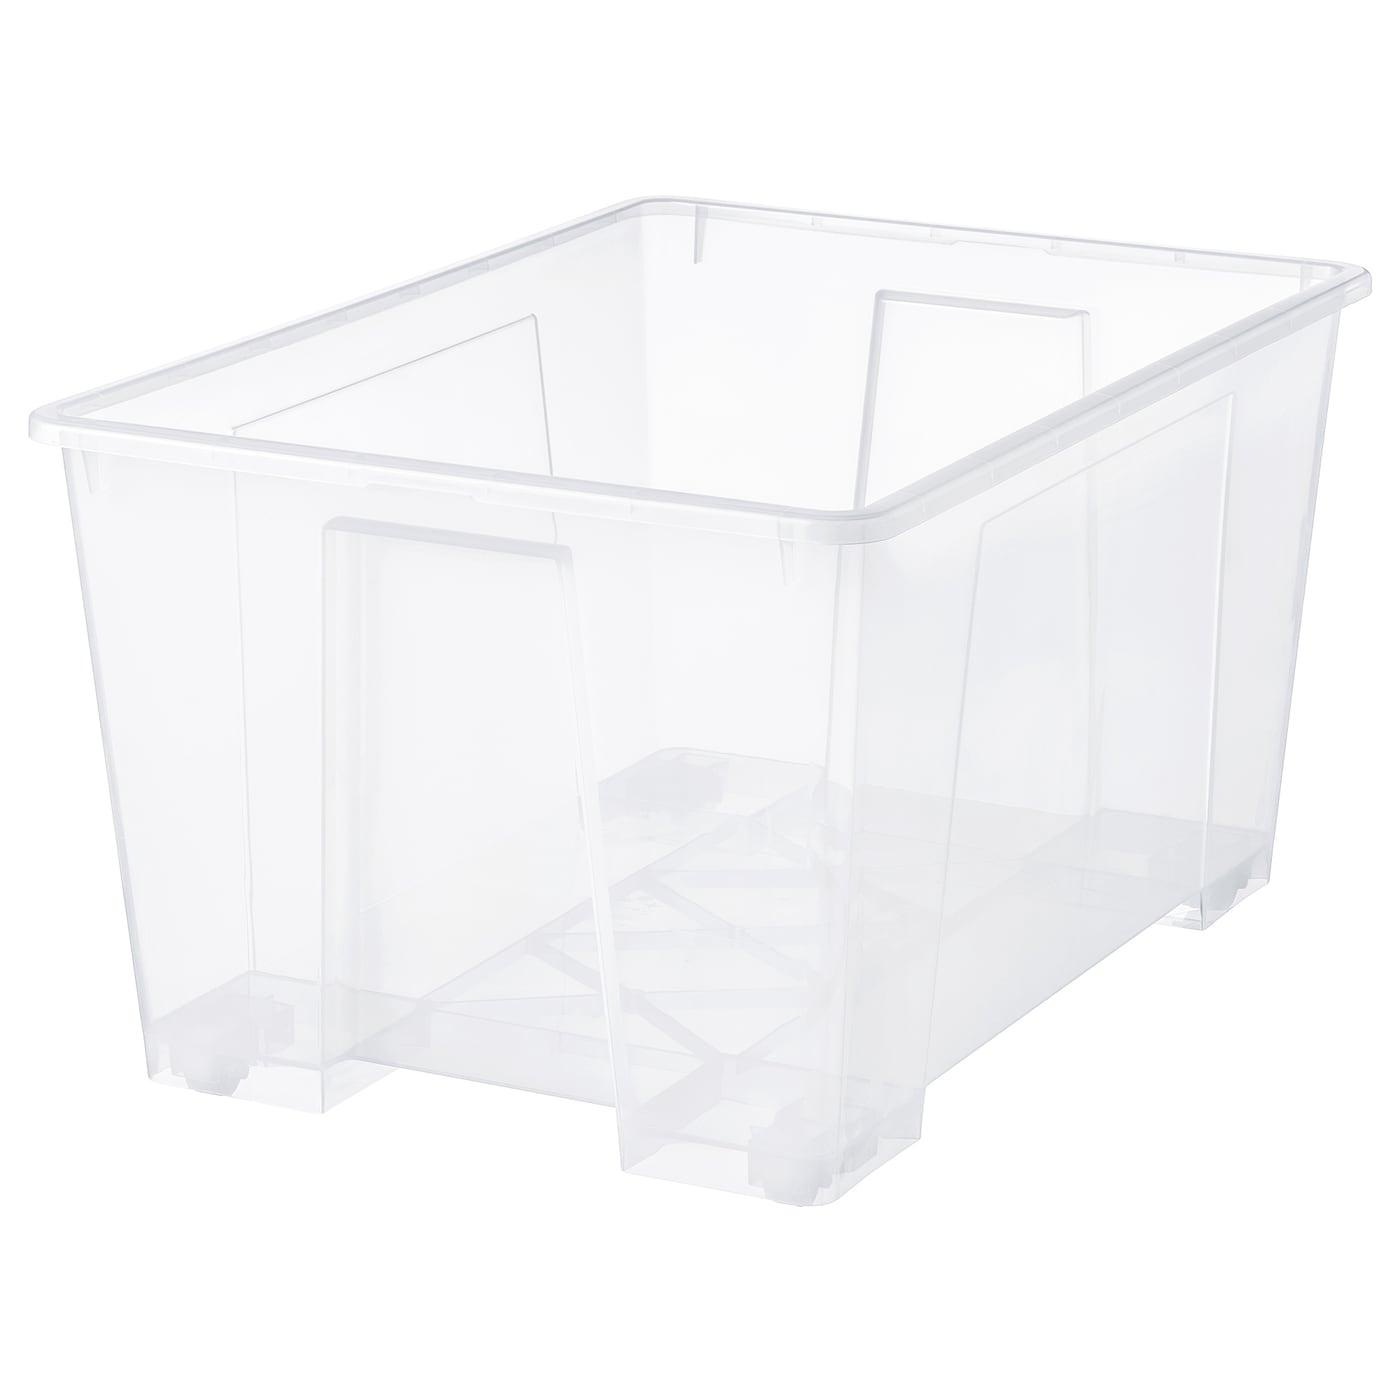 Picture of: Samla Boks Transparent 78x56x43 Cm 130 L Ikea